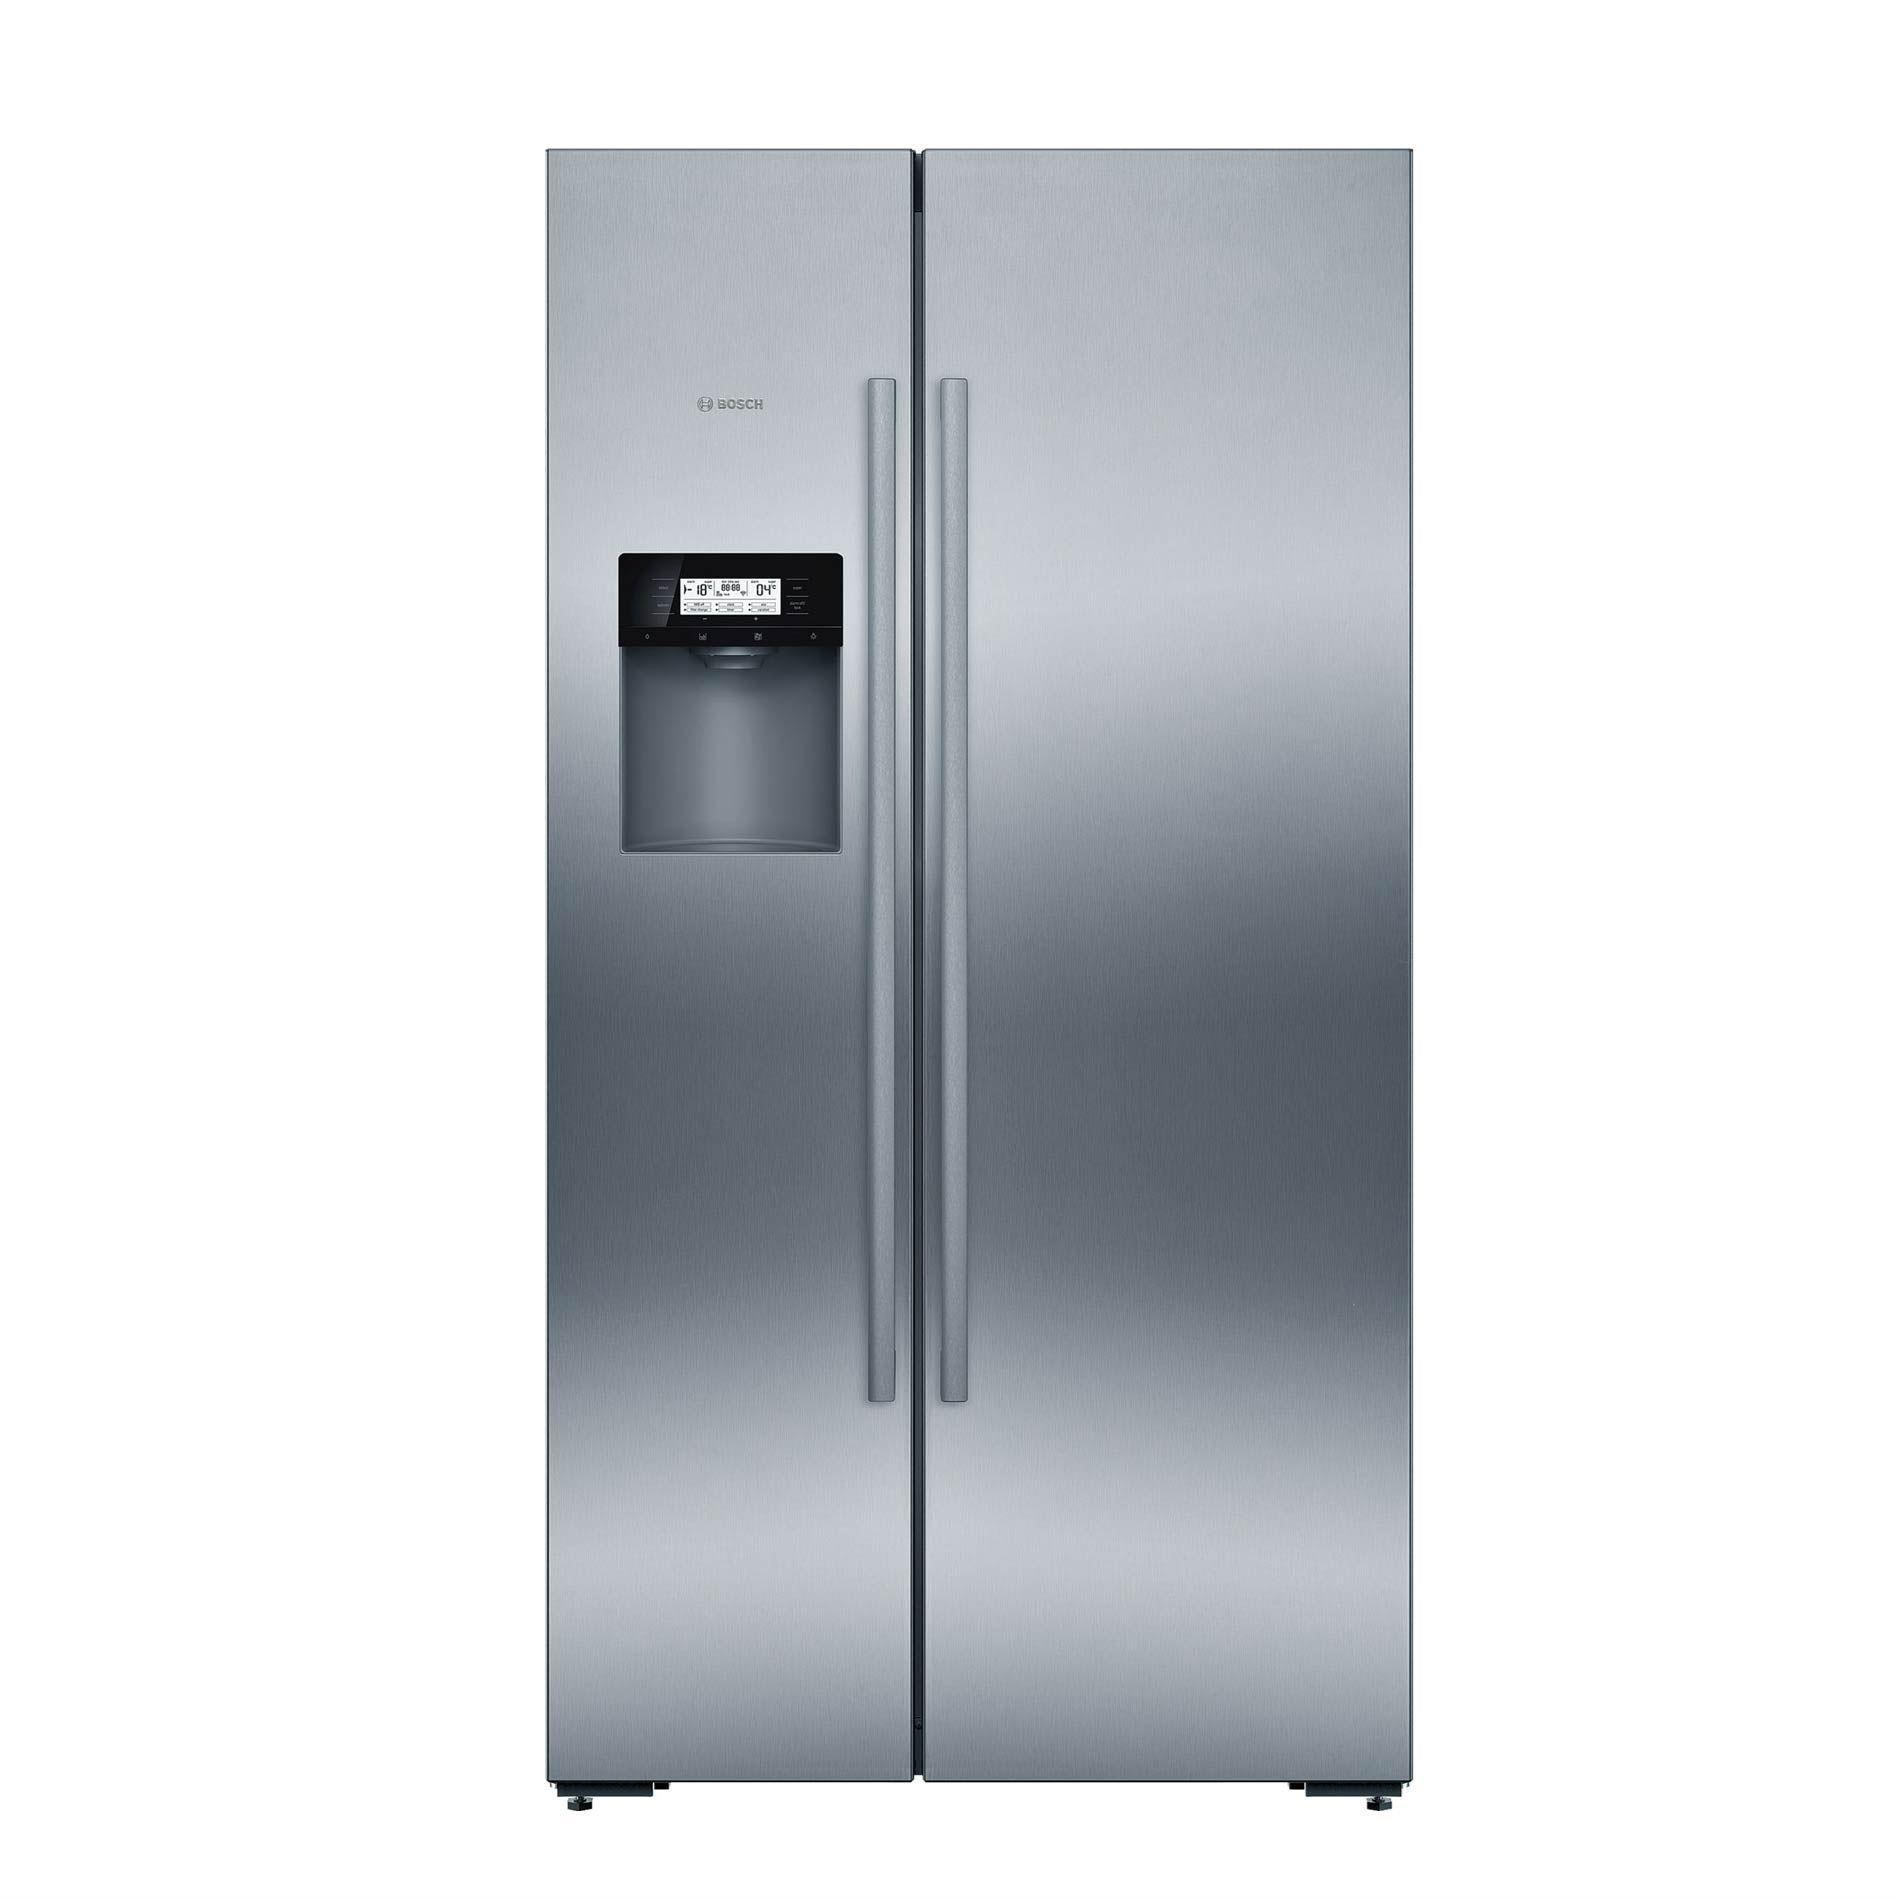 Picture of KAD92AI20G American Style Fridge Freezer